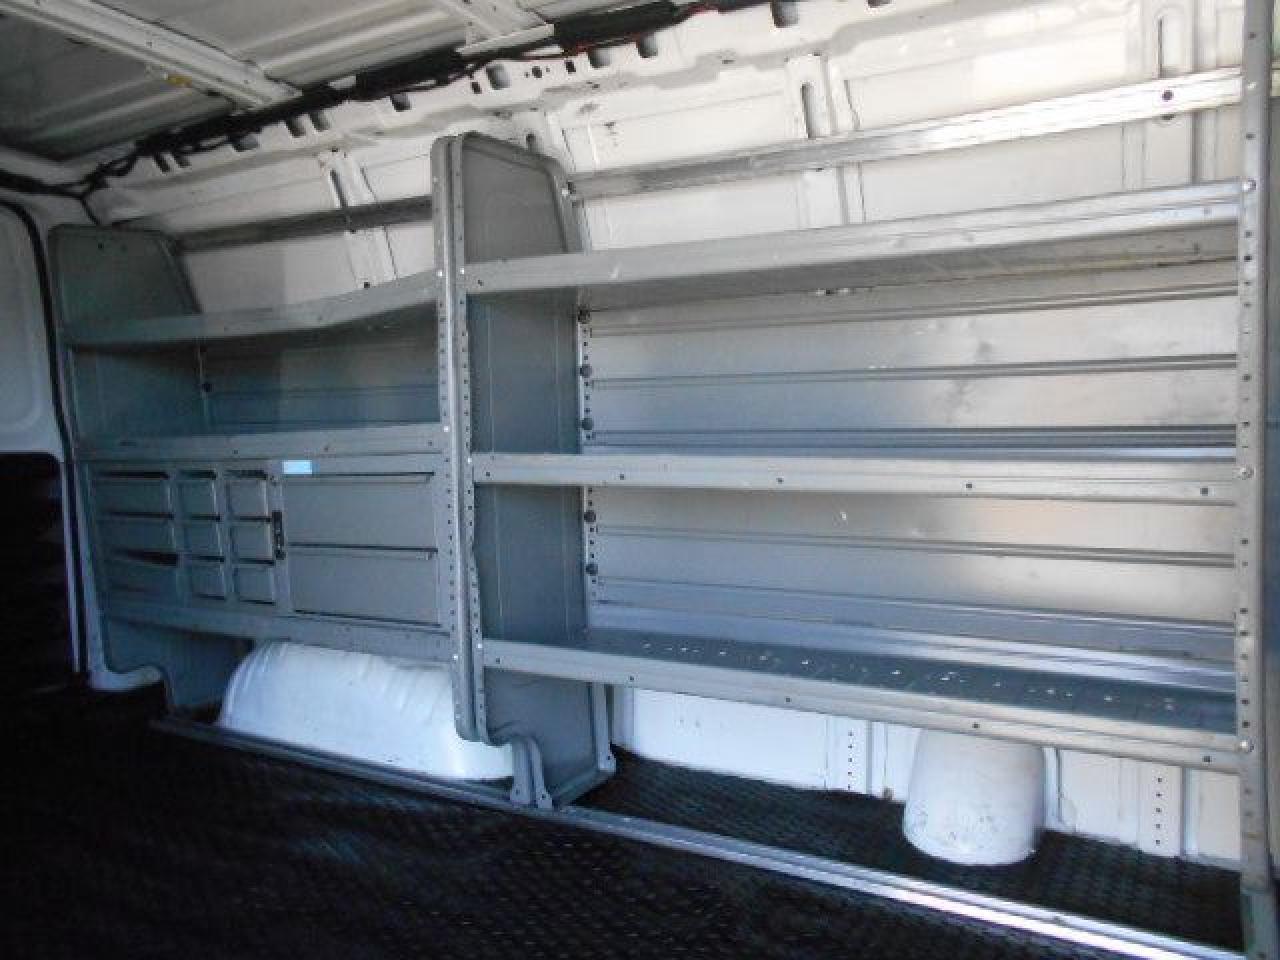 2012 Chevrolet Express 2500 2500HD Cargo 4.8L Loaded Divider Shelves Certified